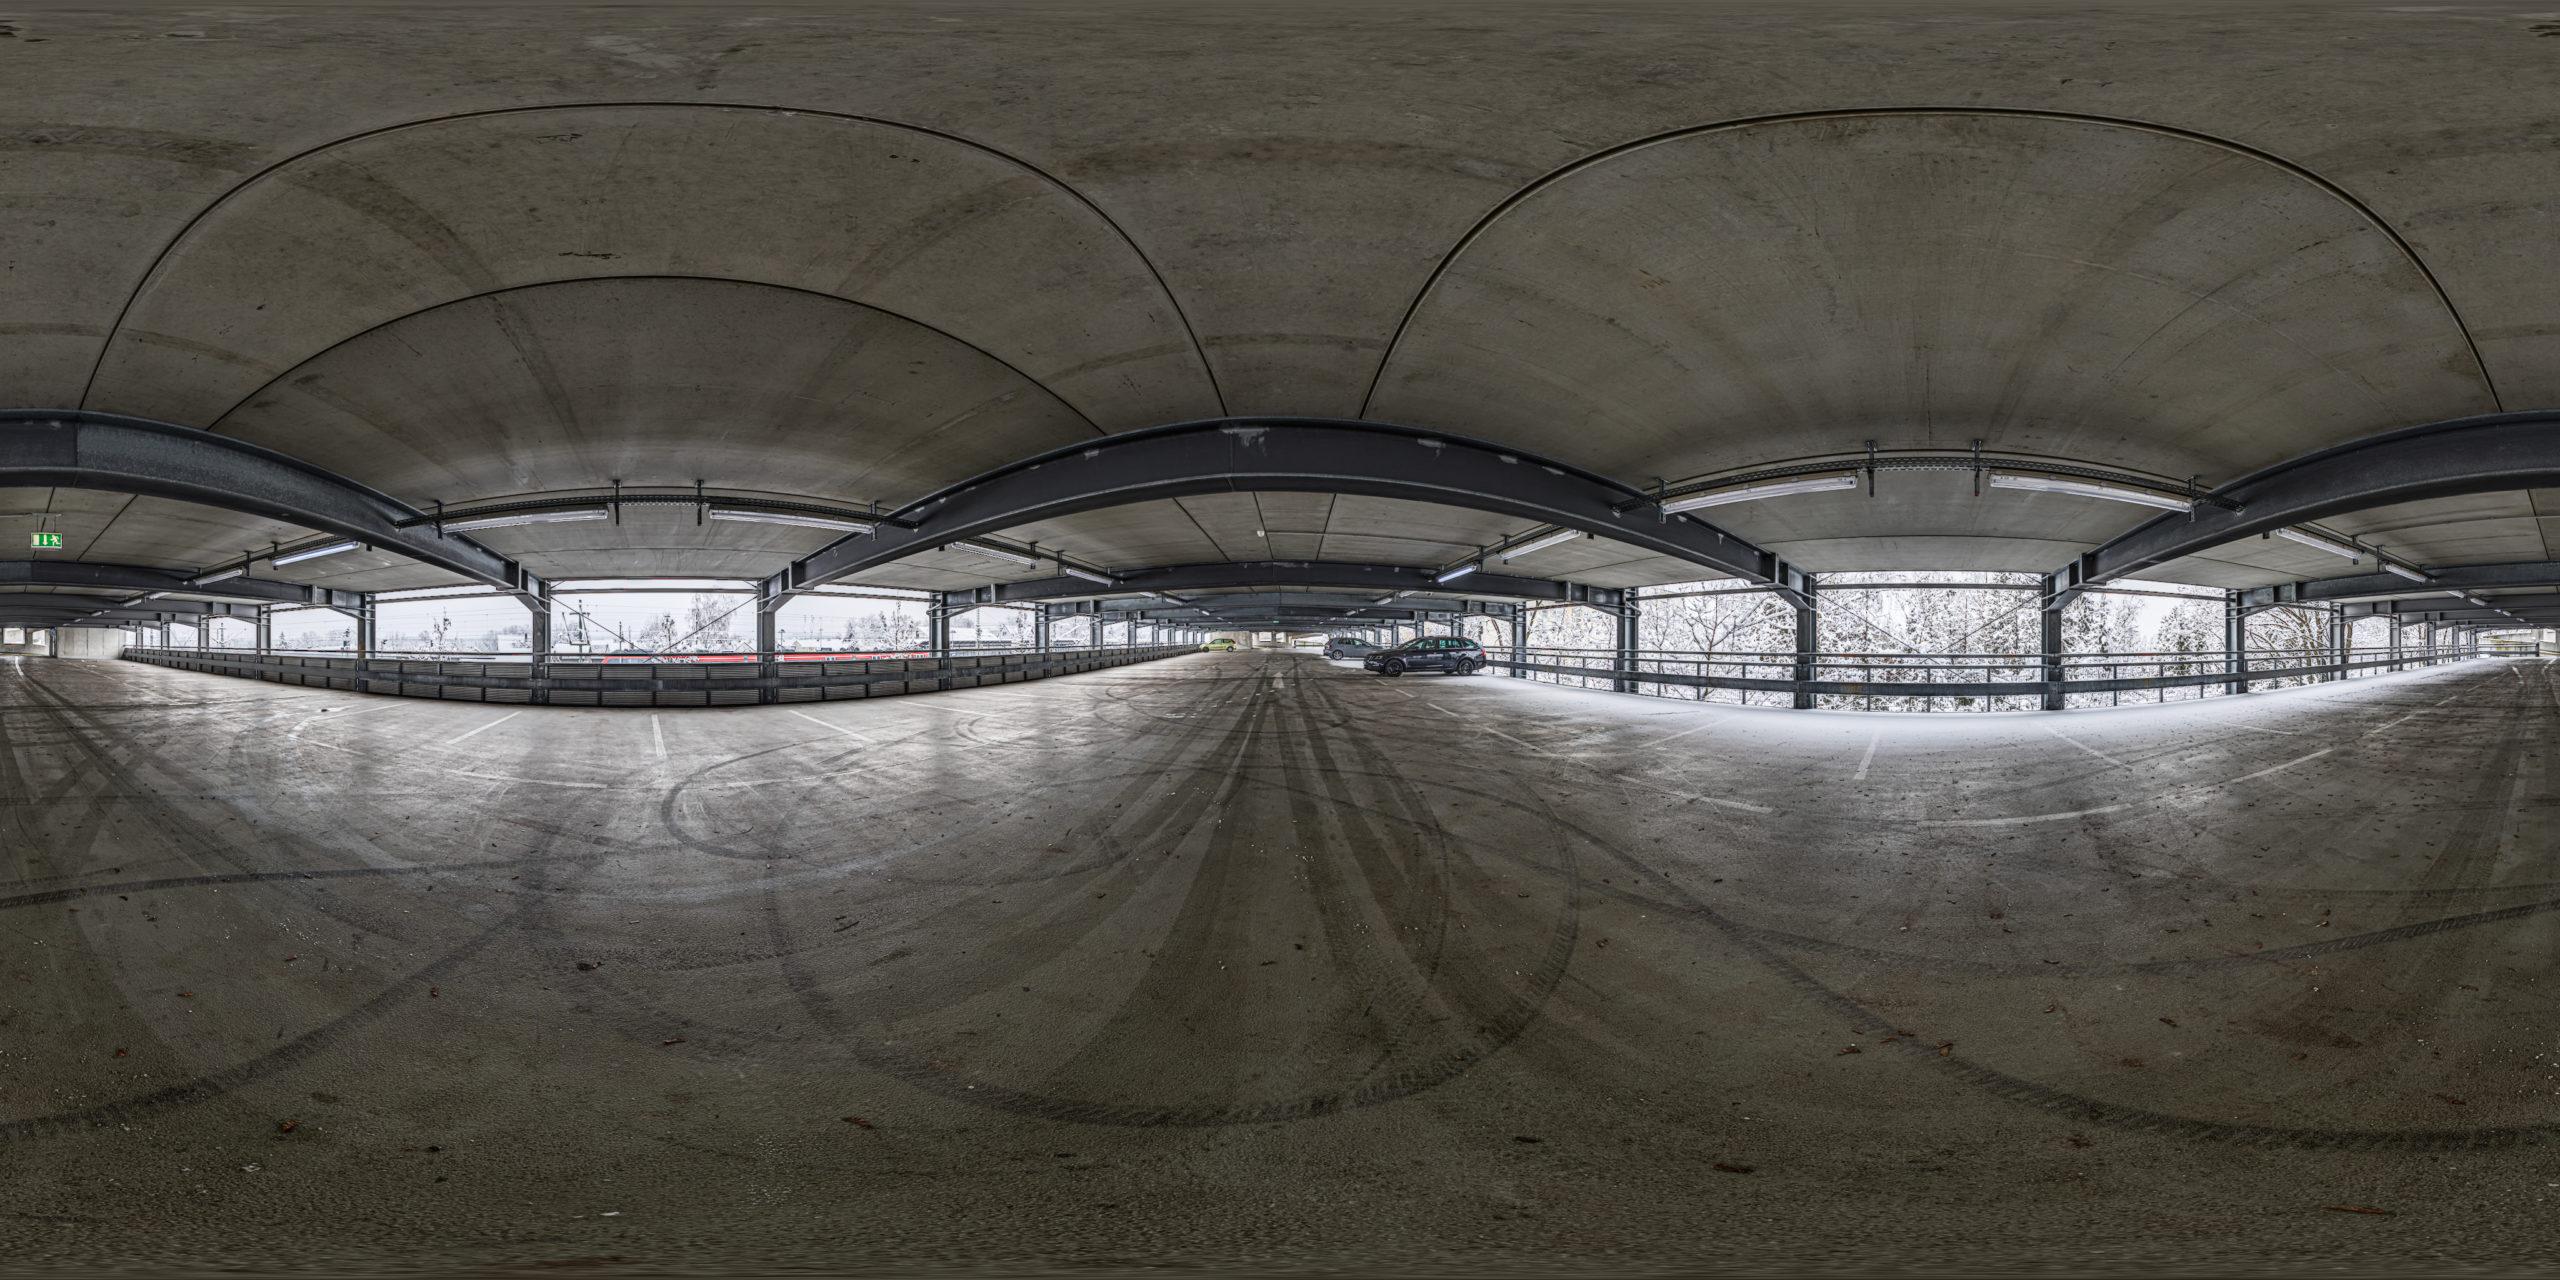 HDRI-Skies-Parking-Garage-Rail-Road-Station-Schwabach